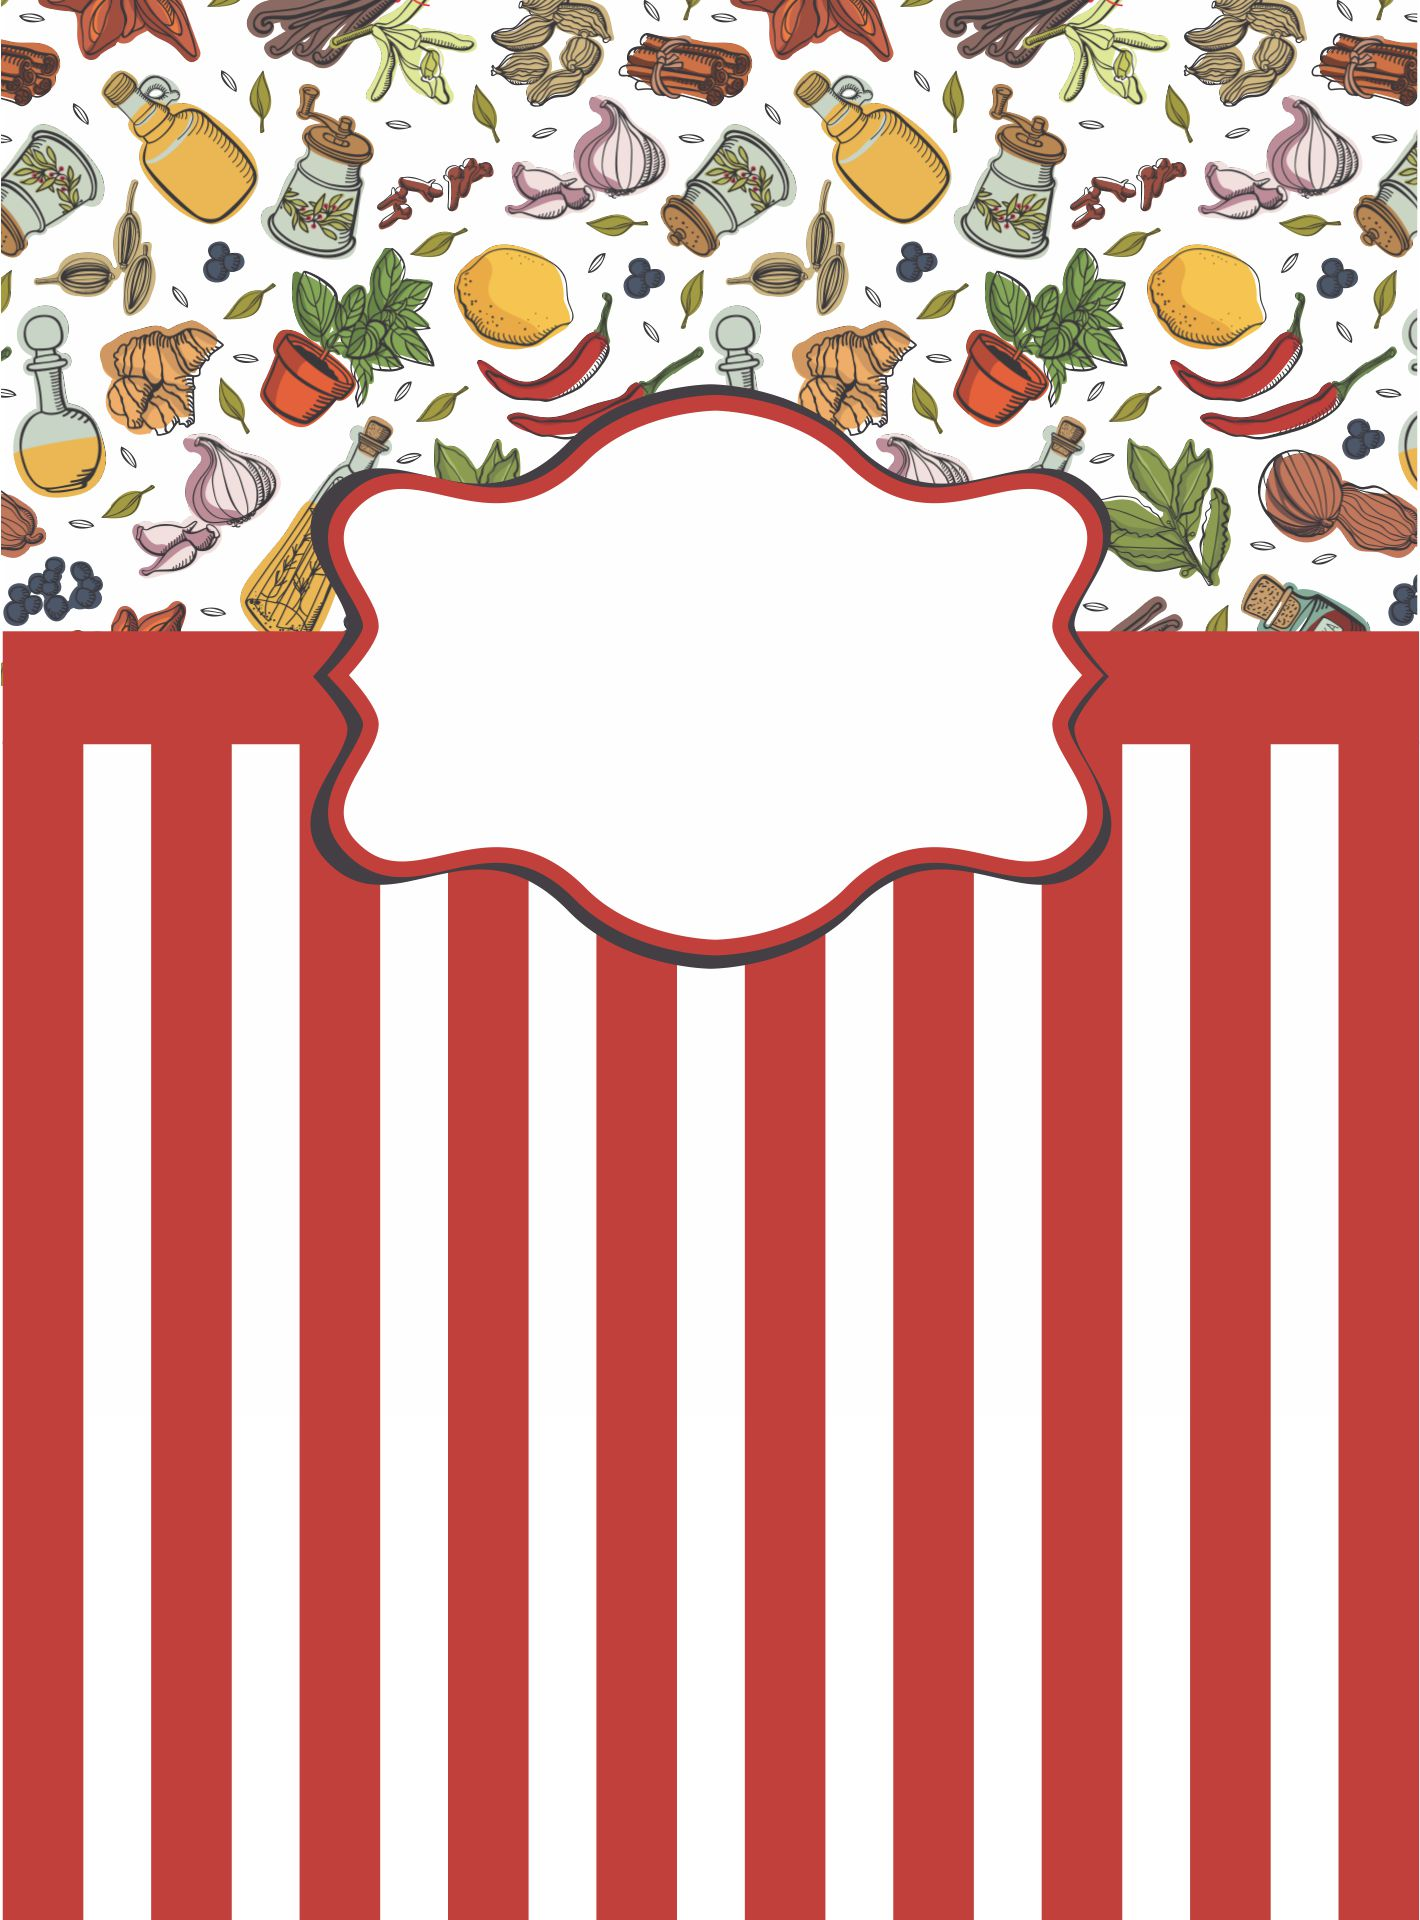 Printable Cookbook Cover Design Template